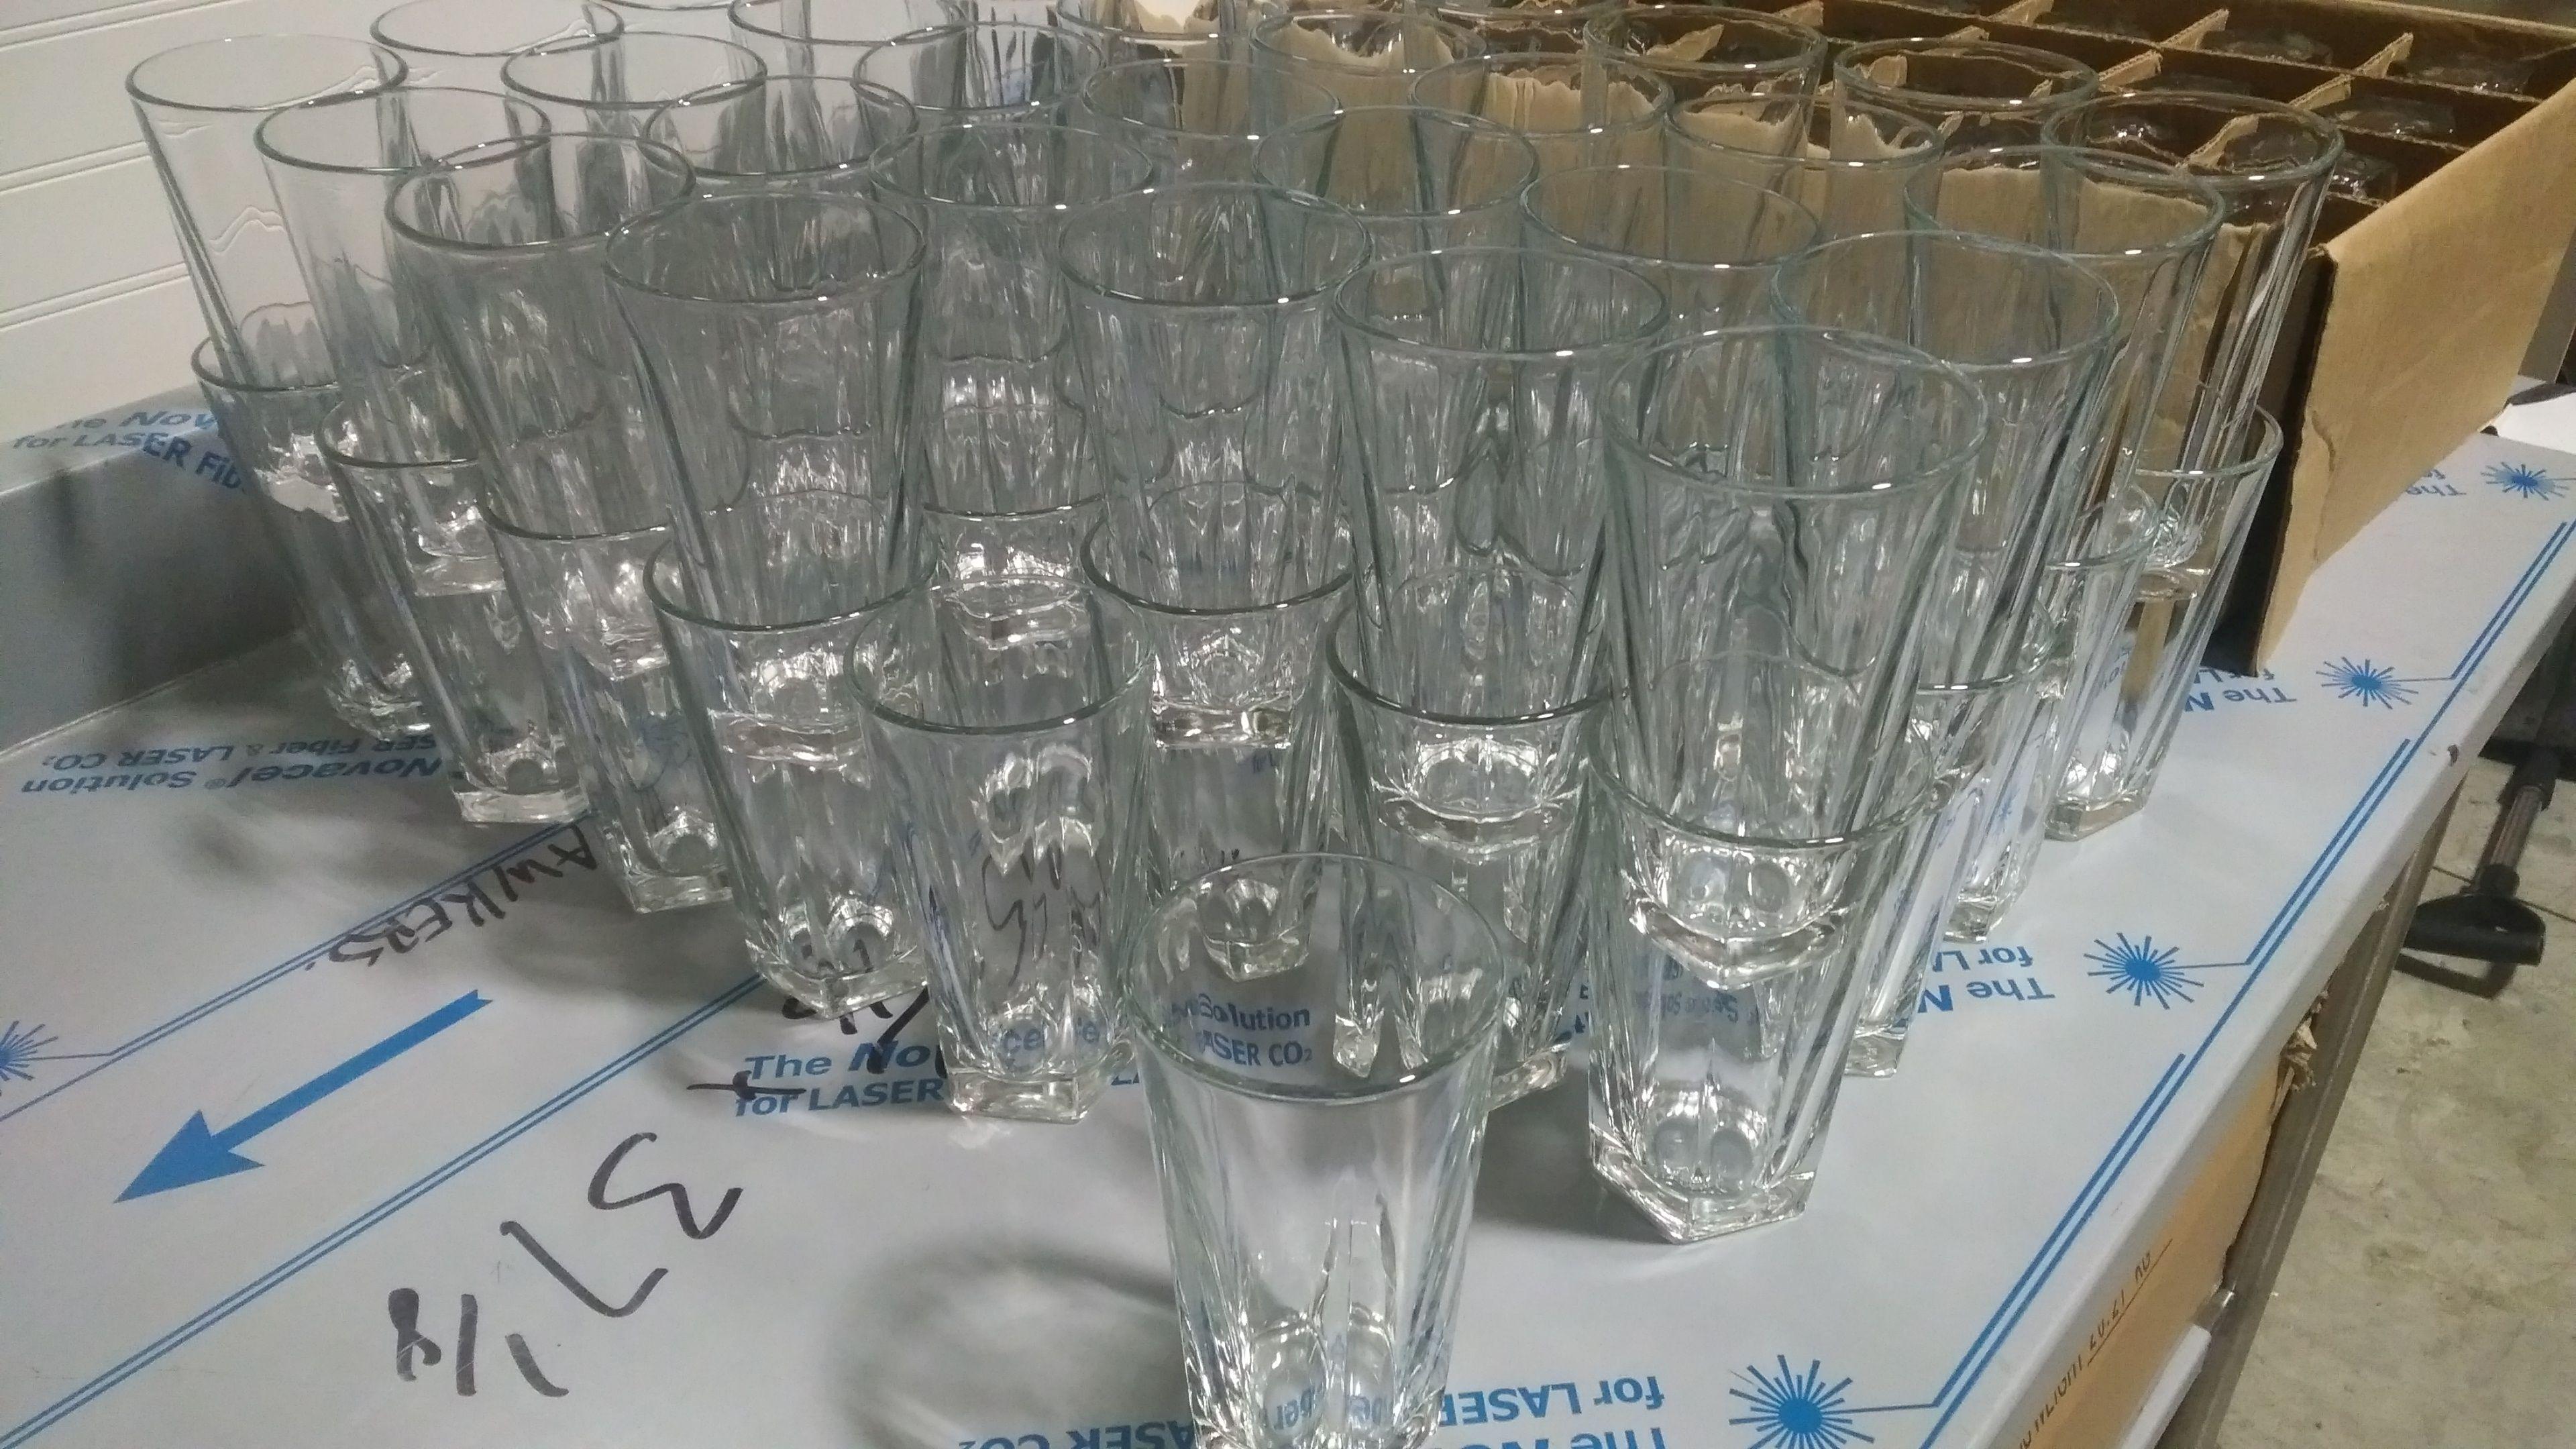 Lot 14 - Libbey 16oz DuraTuff Cooler Glasses - Lot of 67